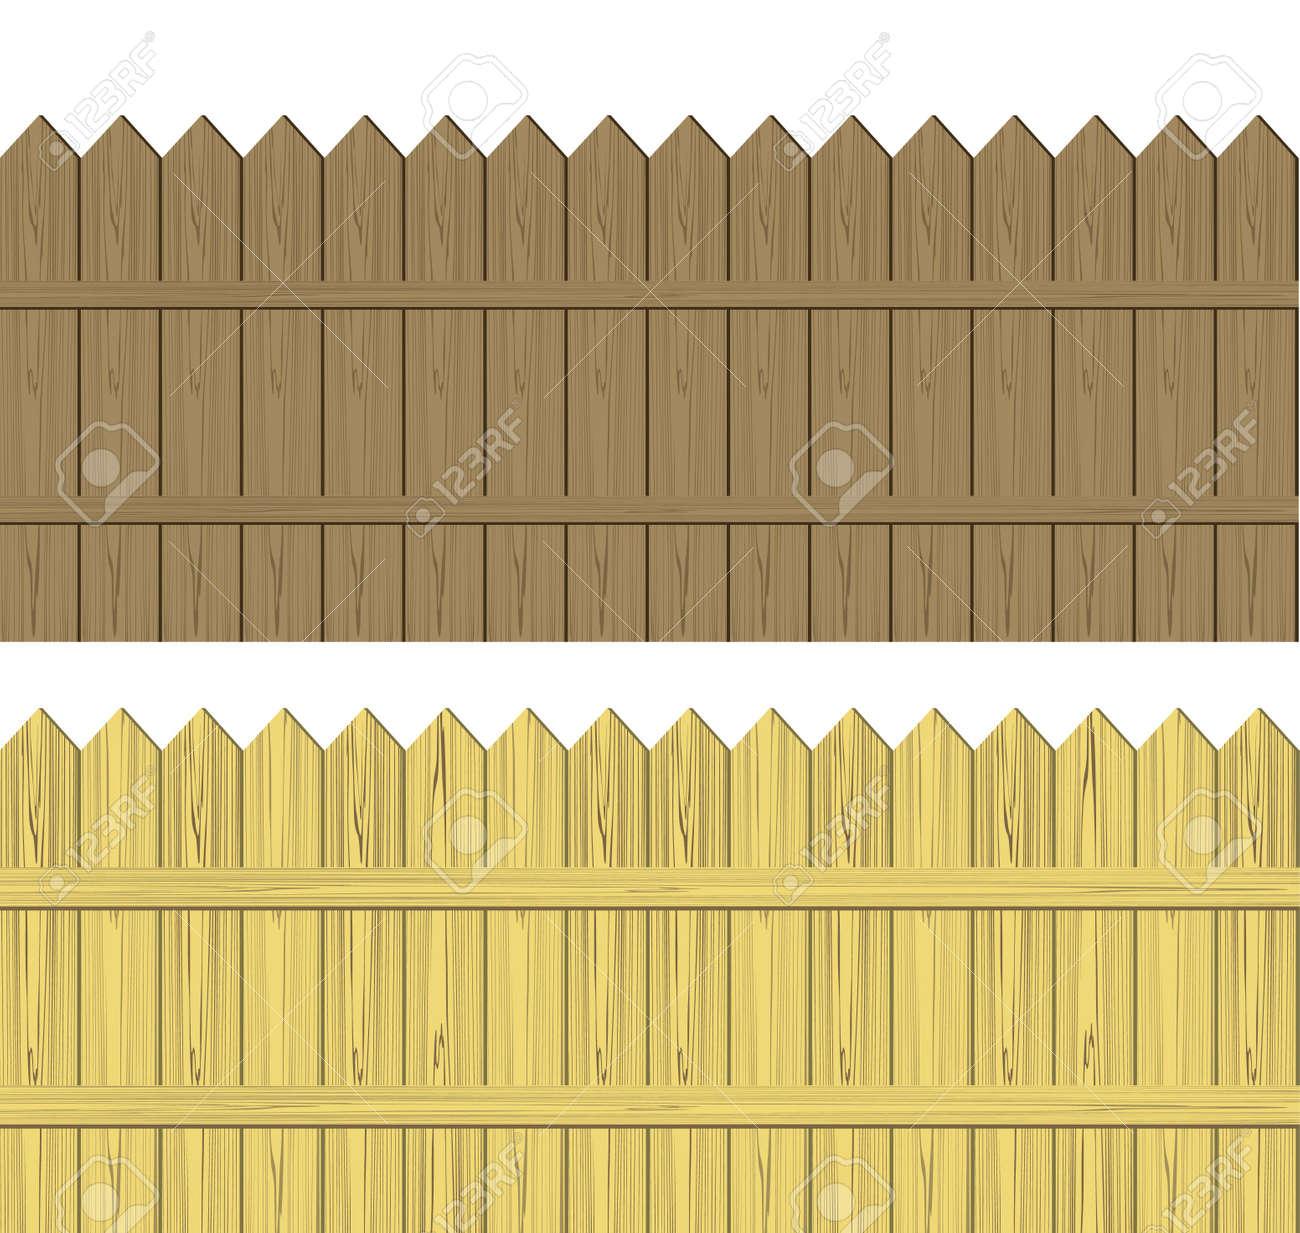 Picket Fence Vector